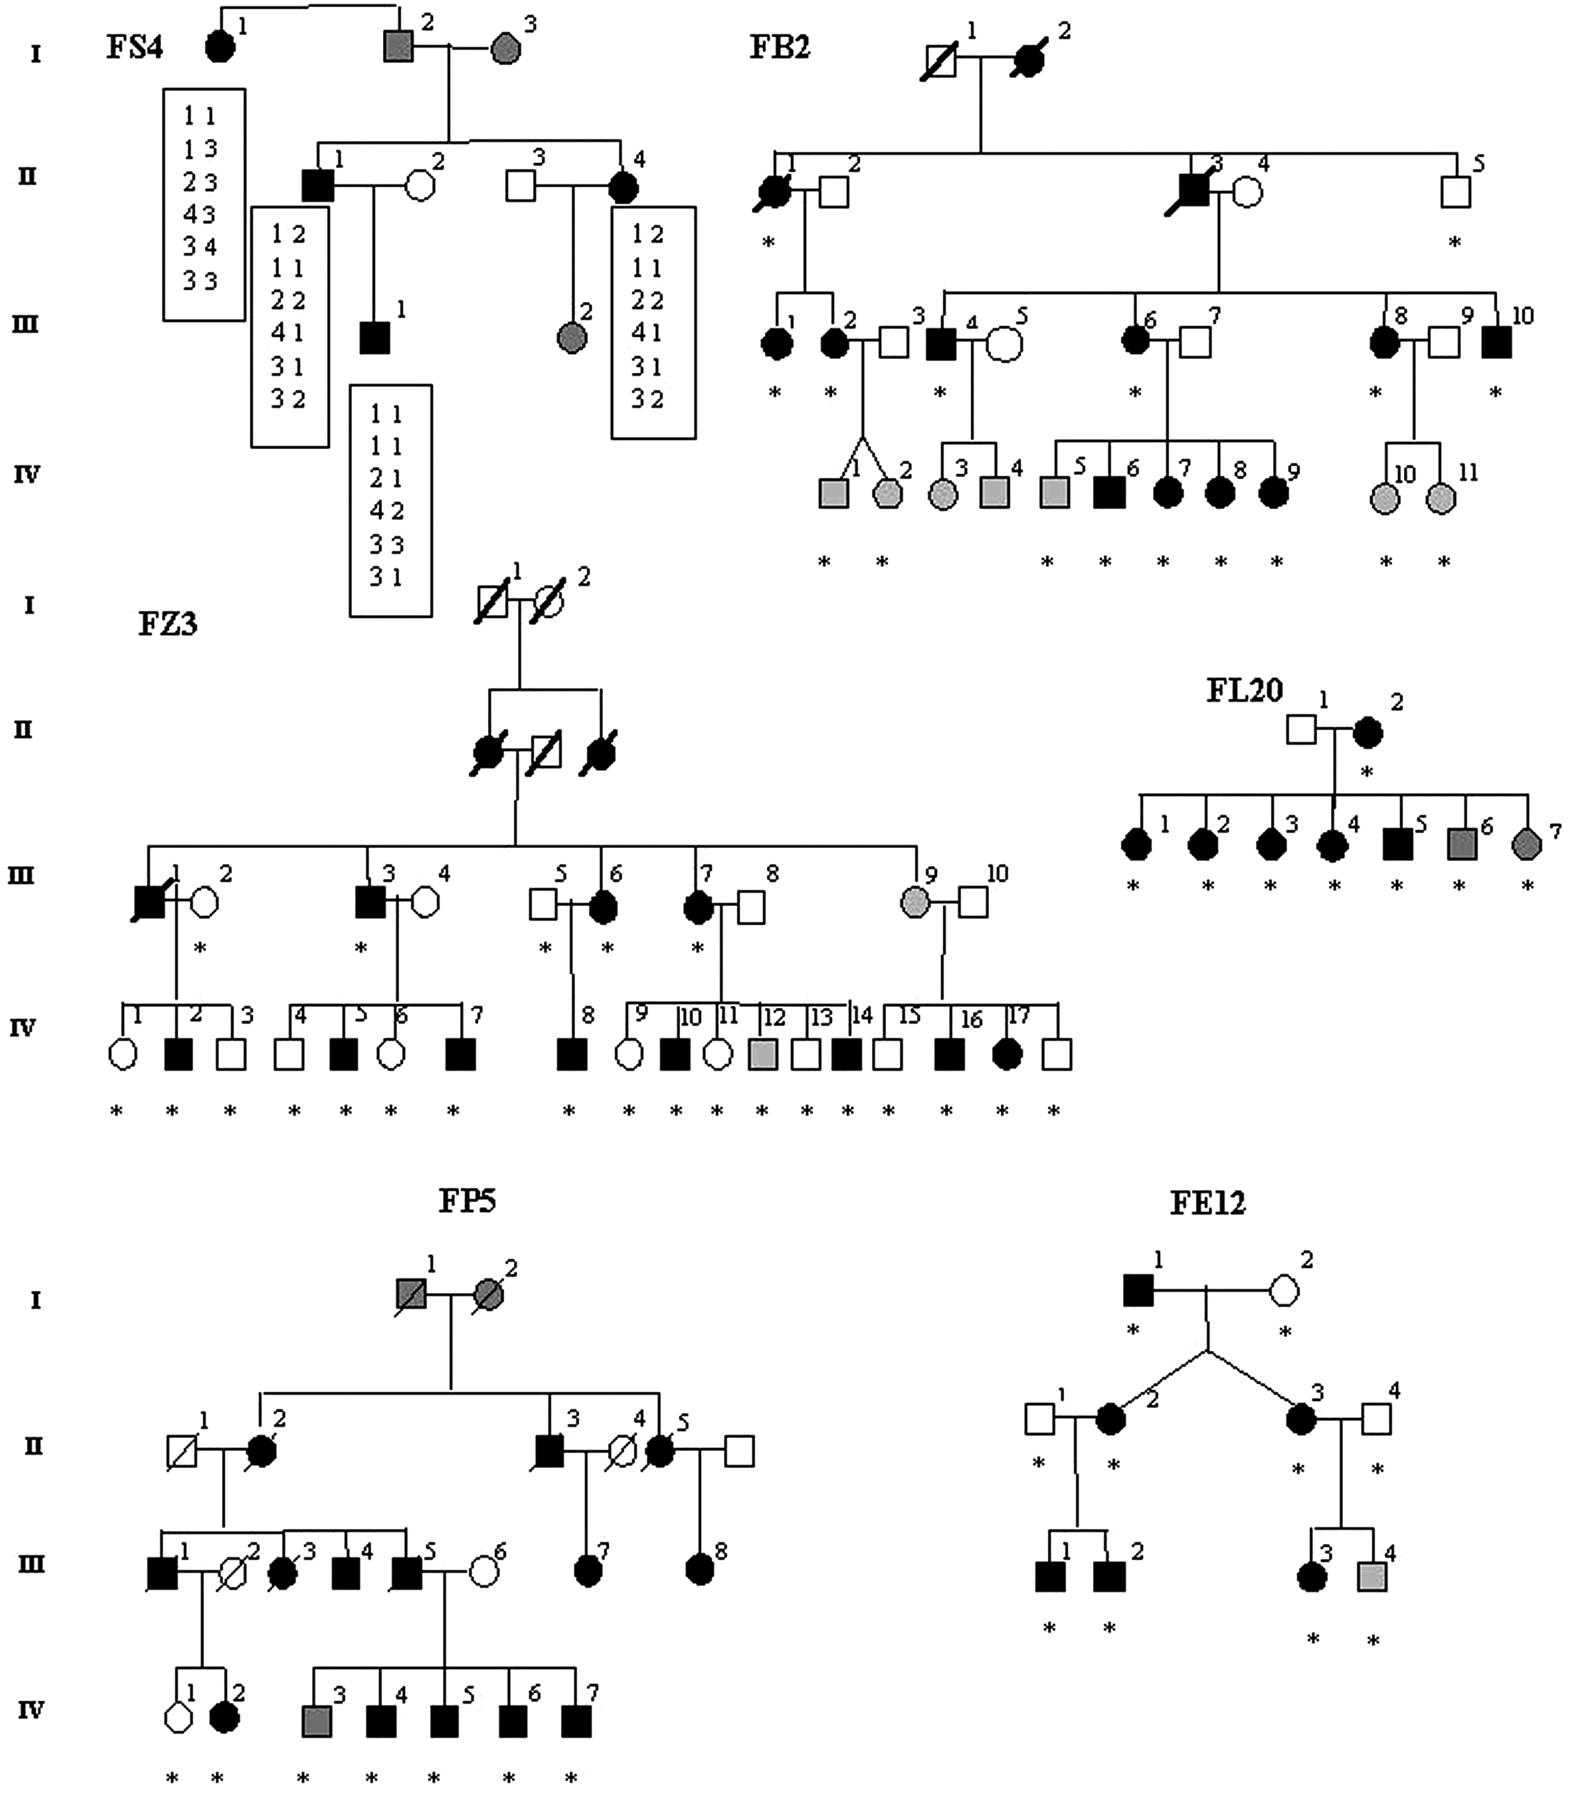 Genetic heterogeneity in familial idiopathic basal ganglia